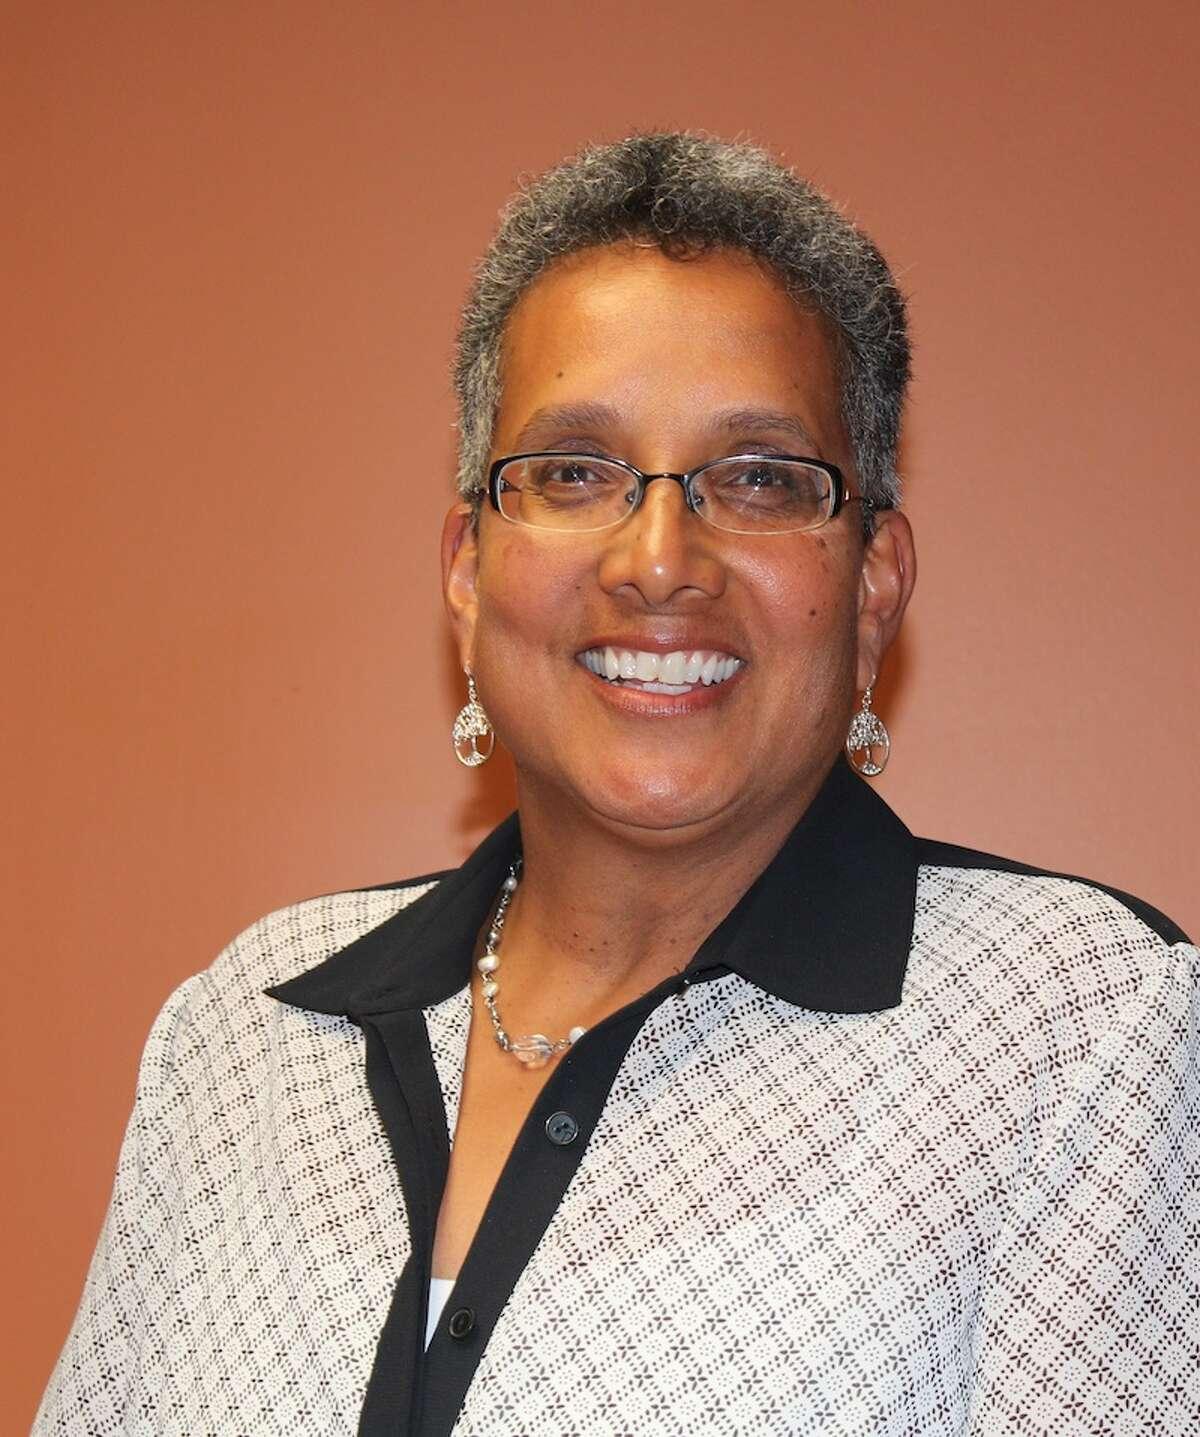 Charmaine Wijeyesinghe, Bethlehem Central Board of Education (Bethlehem Central Schools)